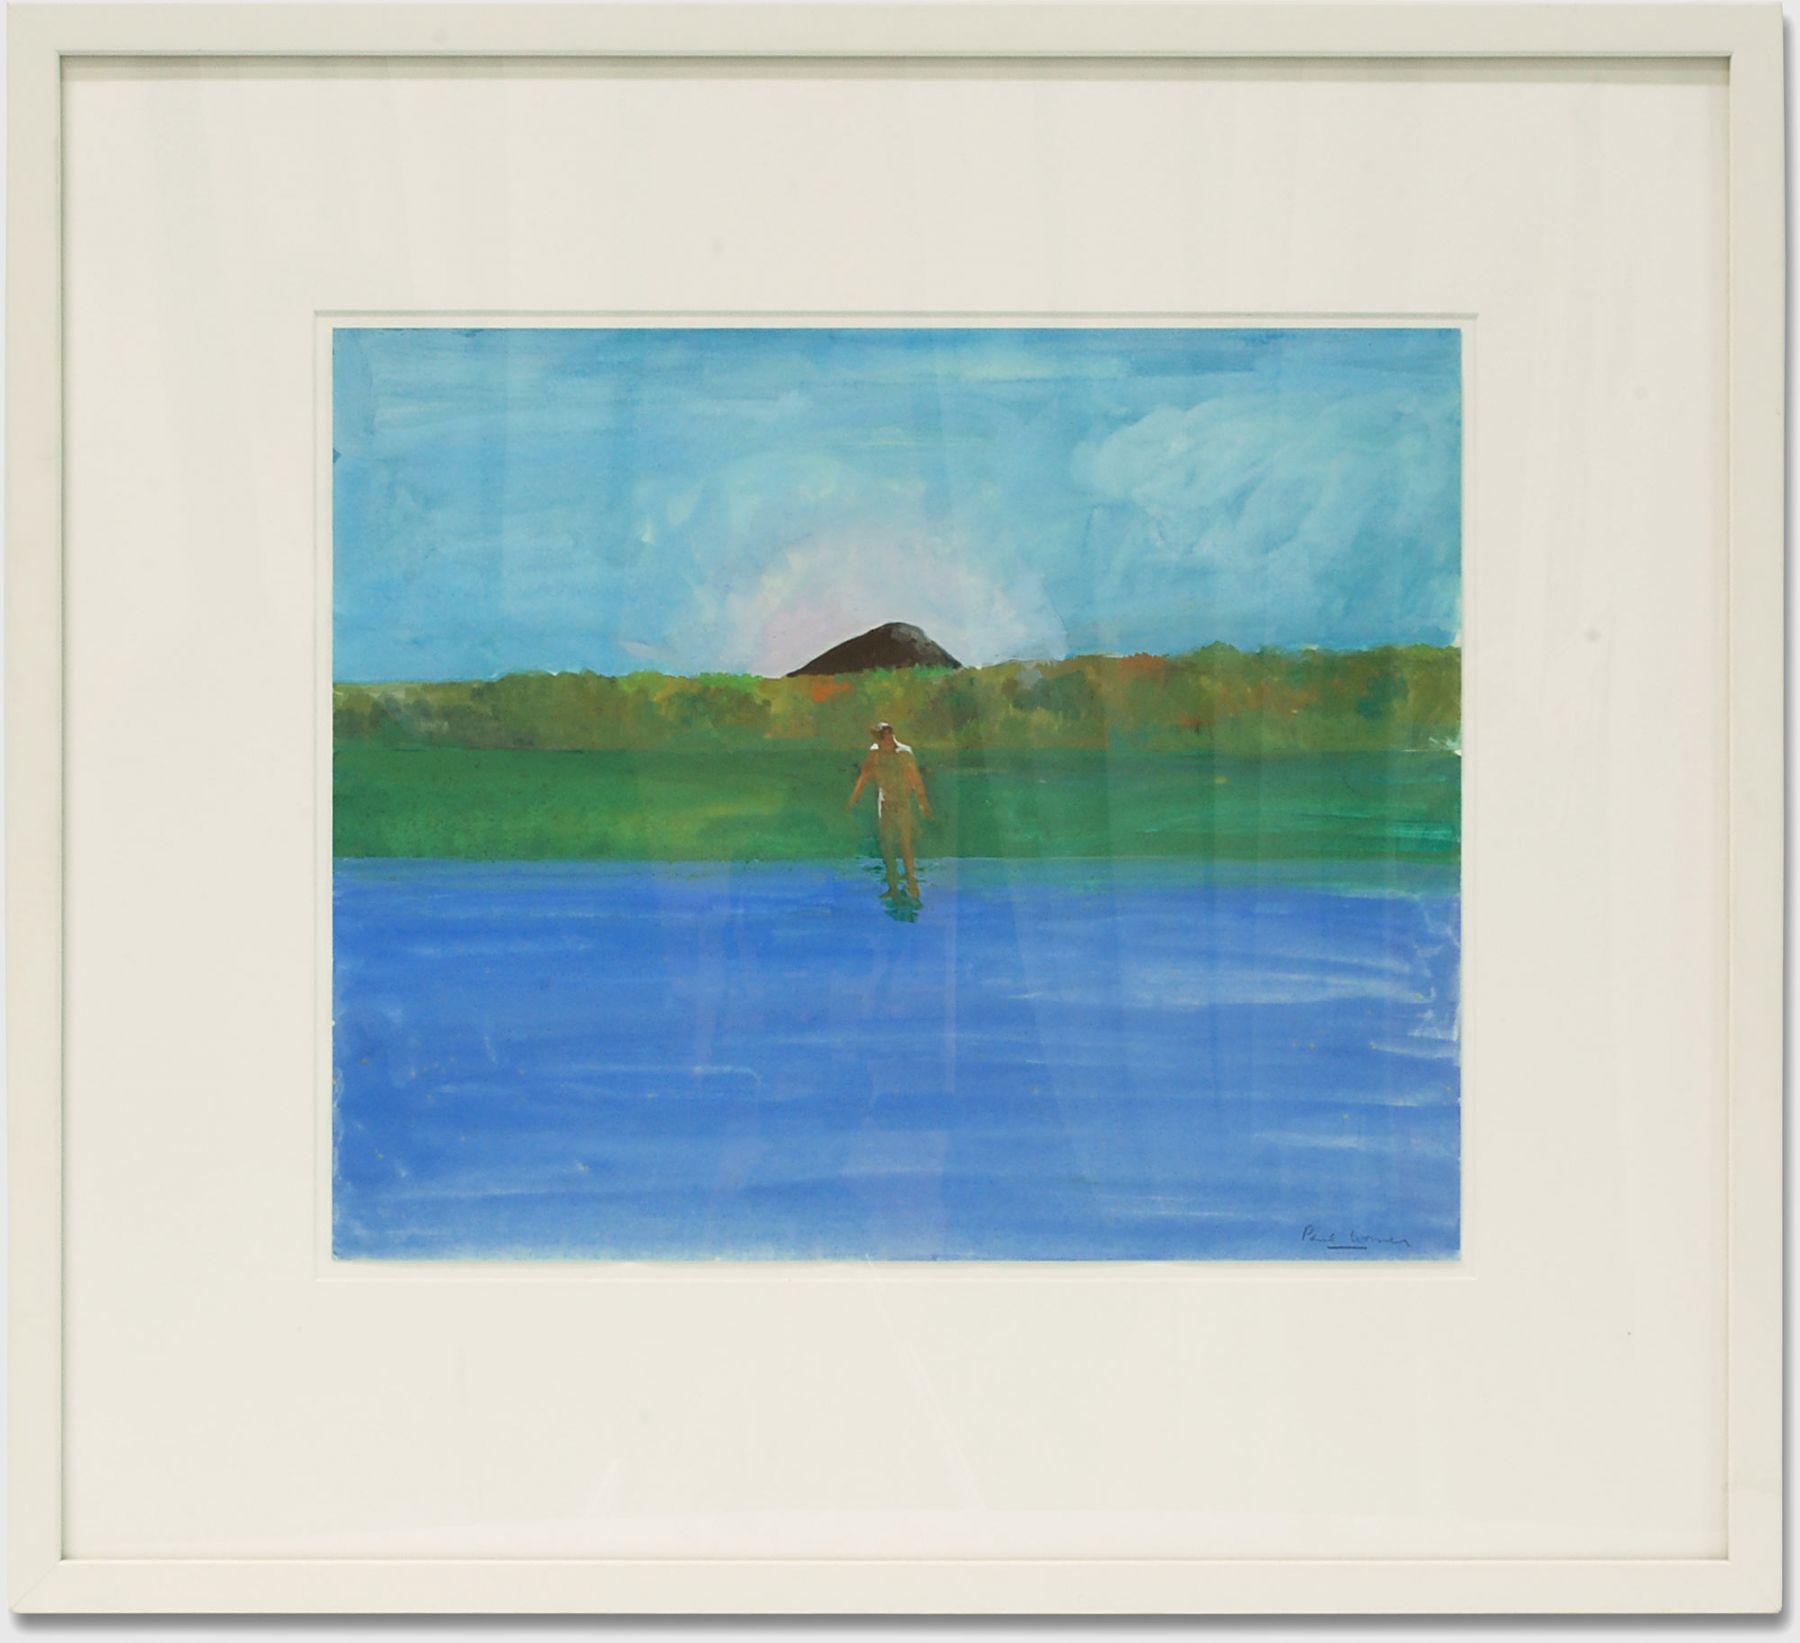 PAUL WONNER (1920-2008), Lake, Nude, Black Hill, c. 1967-68